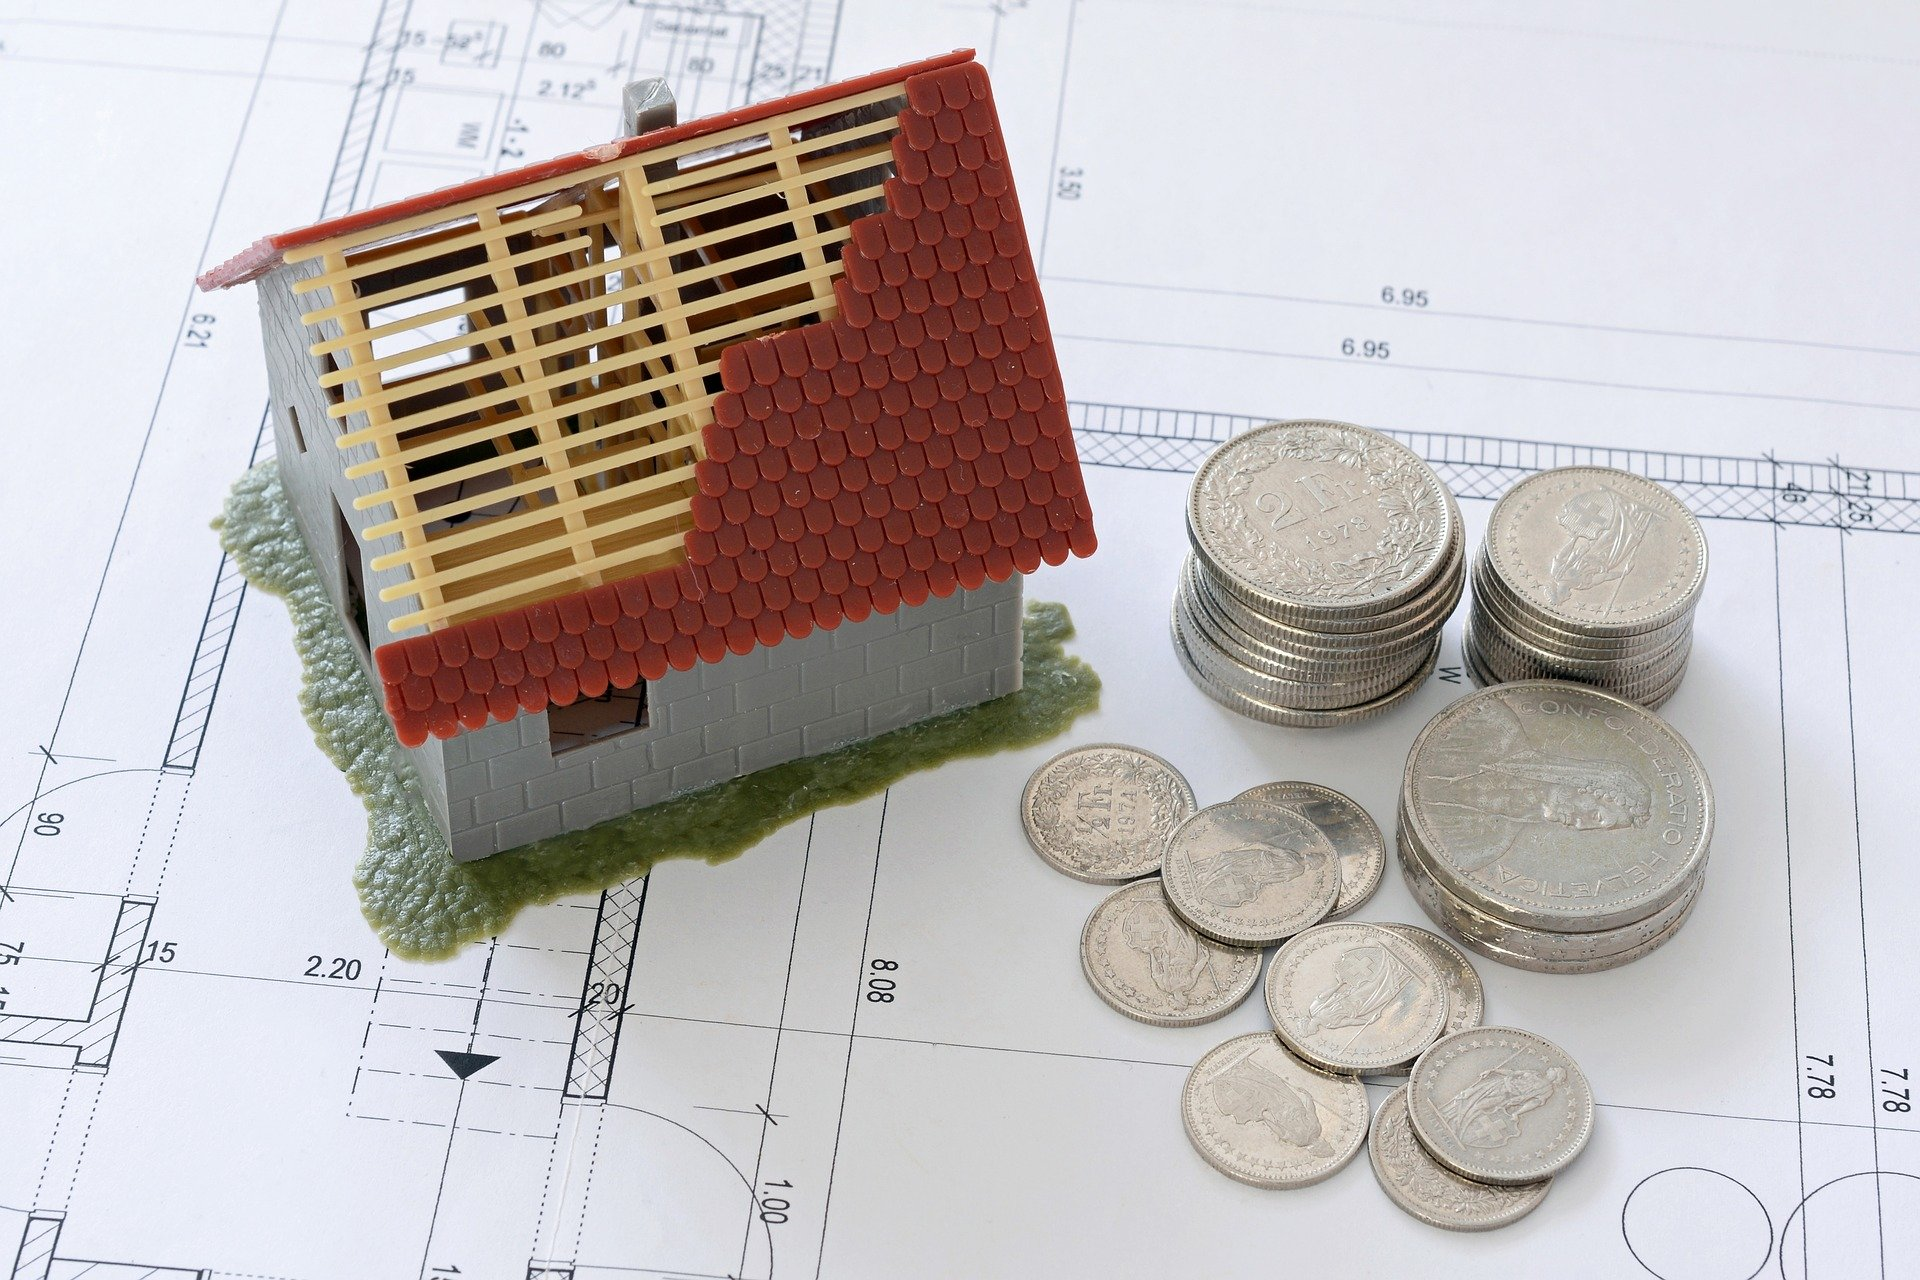 Ecobonus e bonus casa, operativi i siti ENEA per invio dati